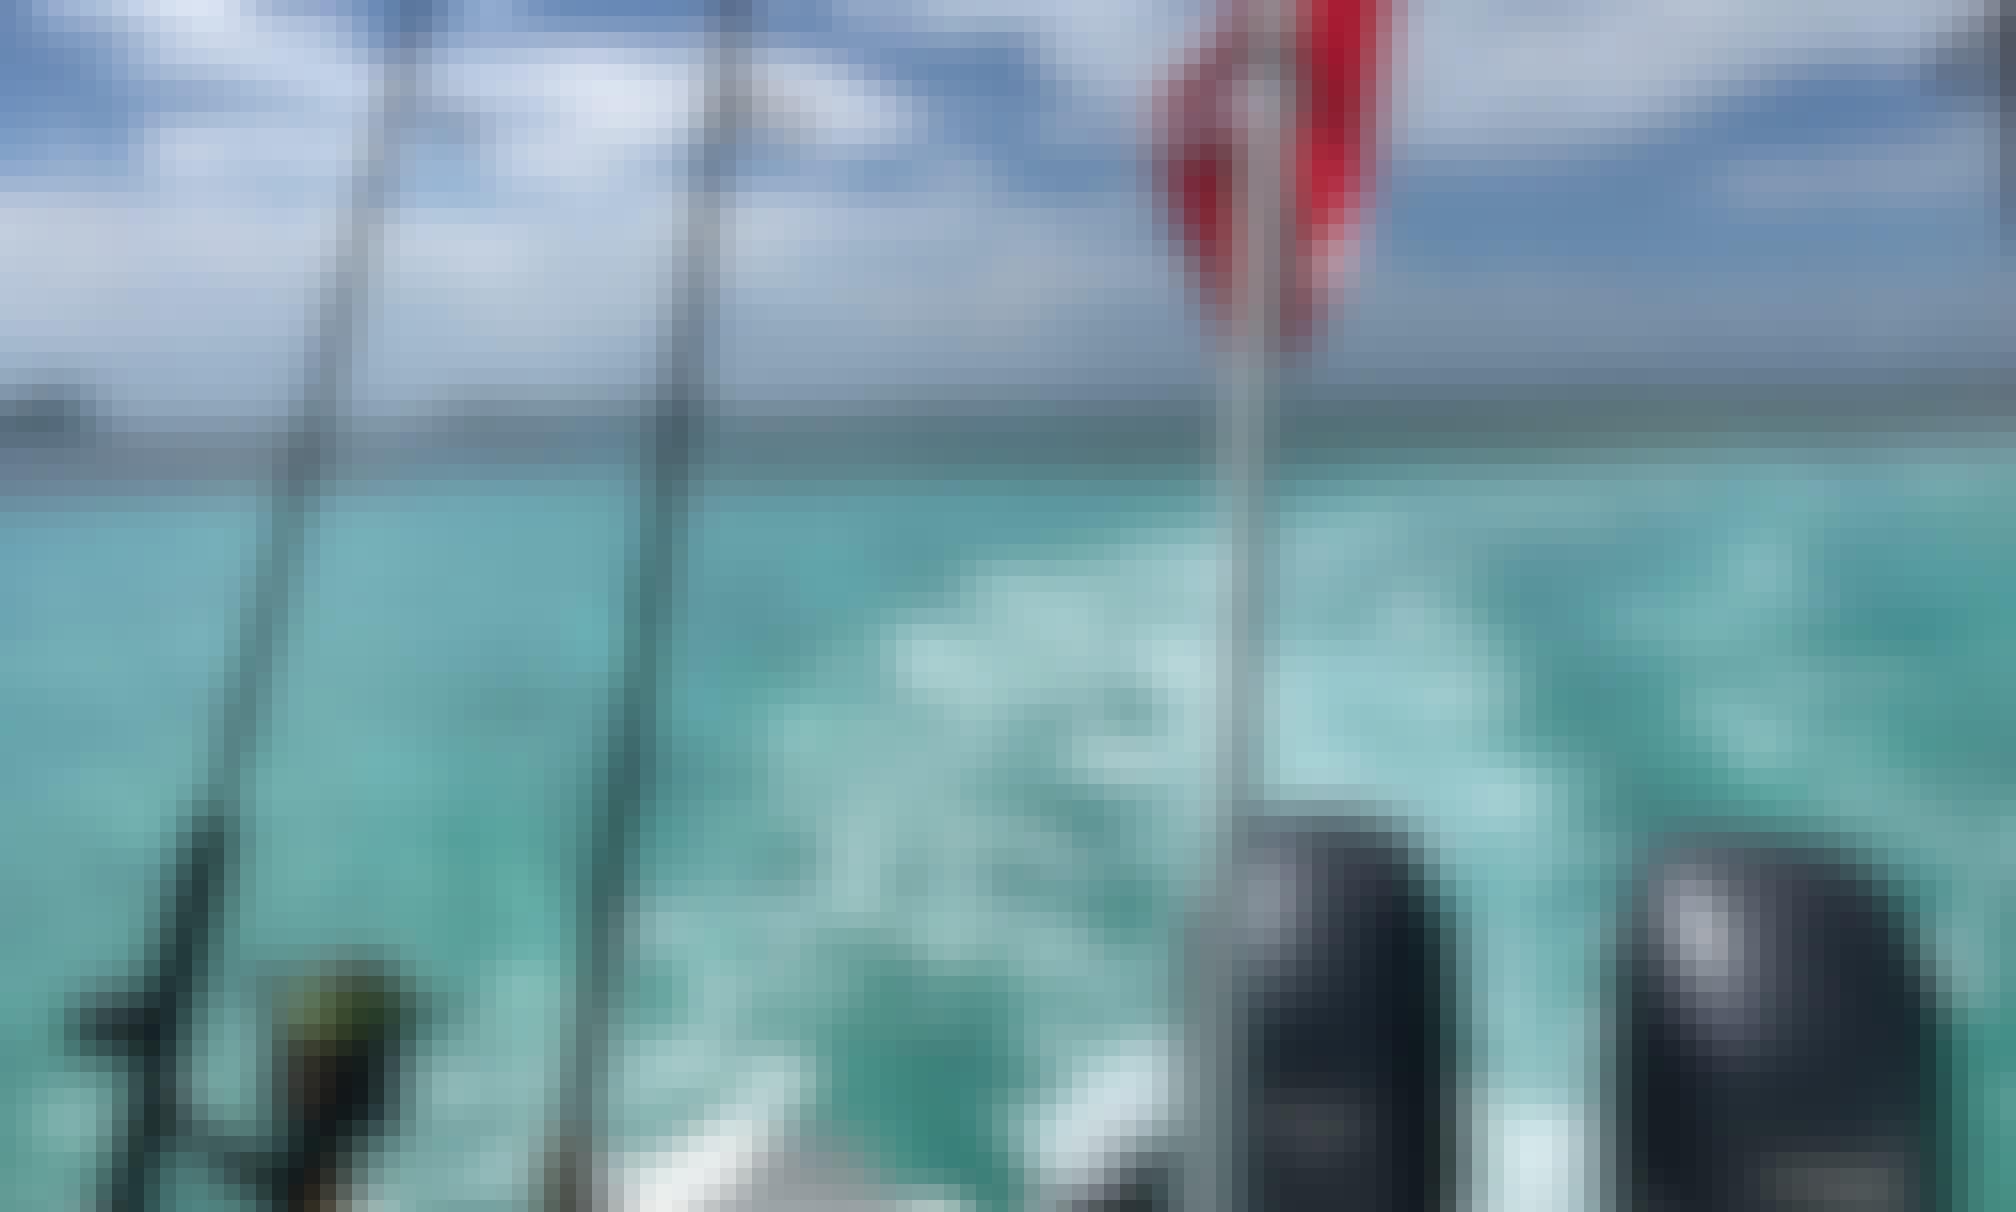 25' Seahunt Center Console Rental in Pompano Beach, Florida